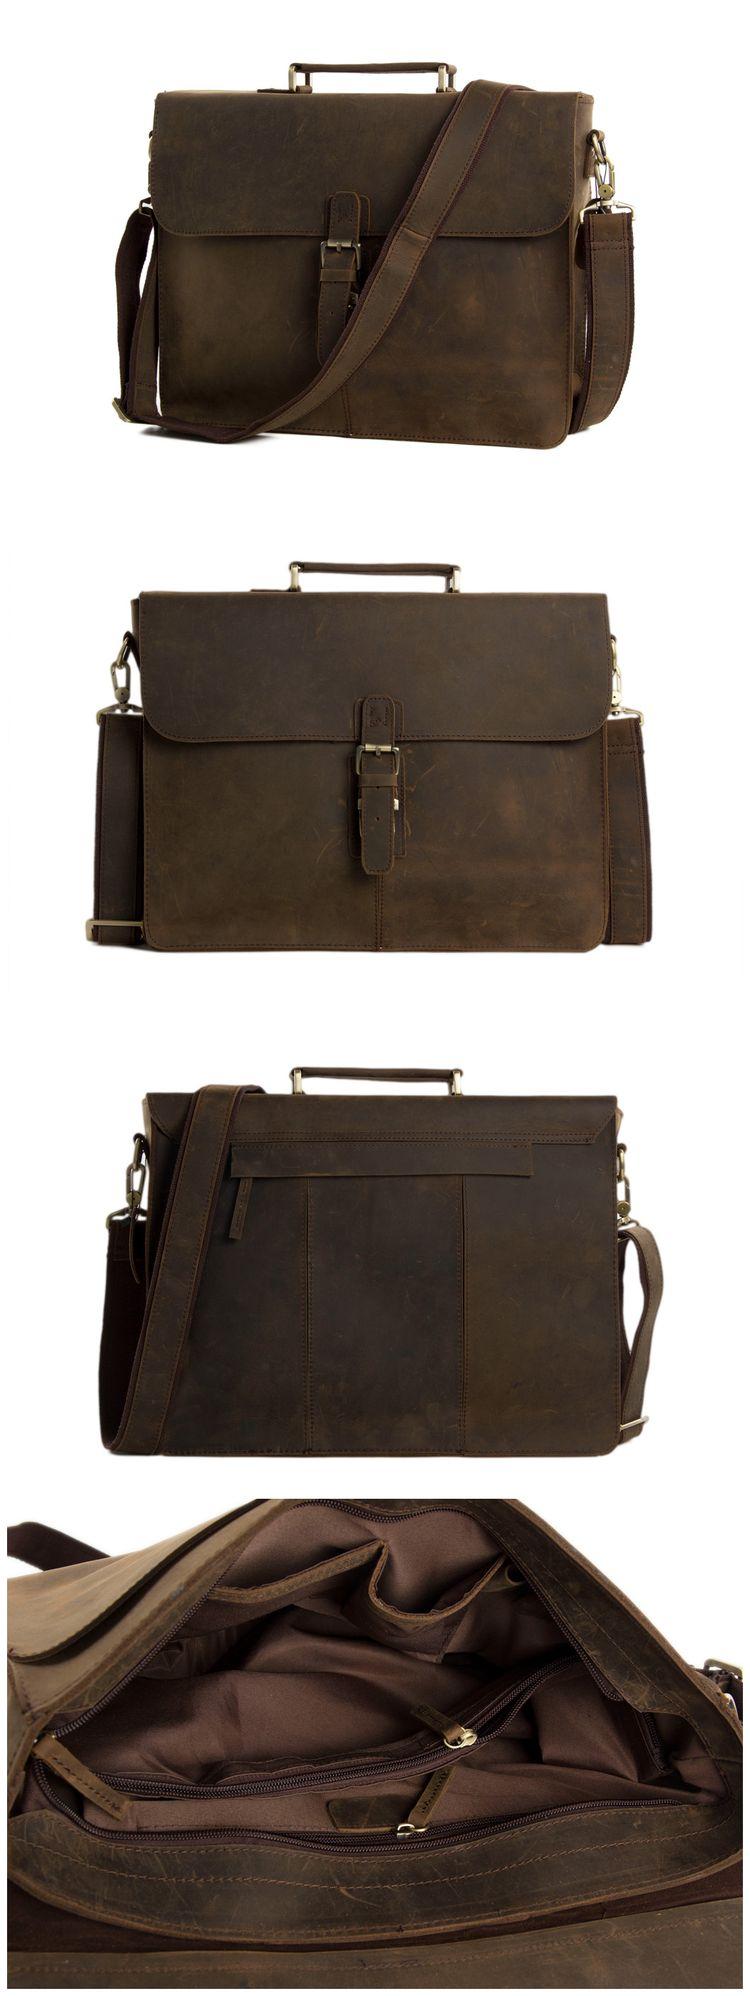 Handmade Vintage Leather Briefcase Messenger Bag  Men s Handbag 7106 from  Unihandmade Leather Studio 4b32e1a6f0